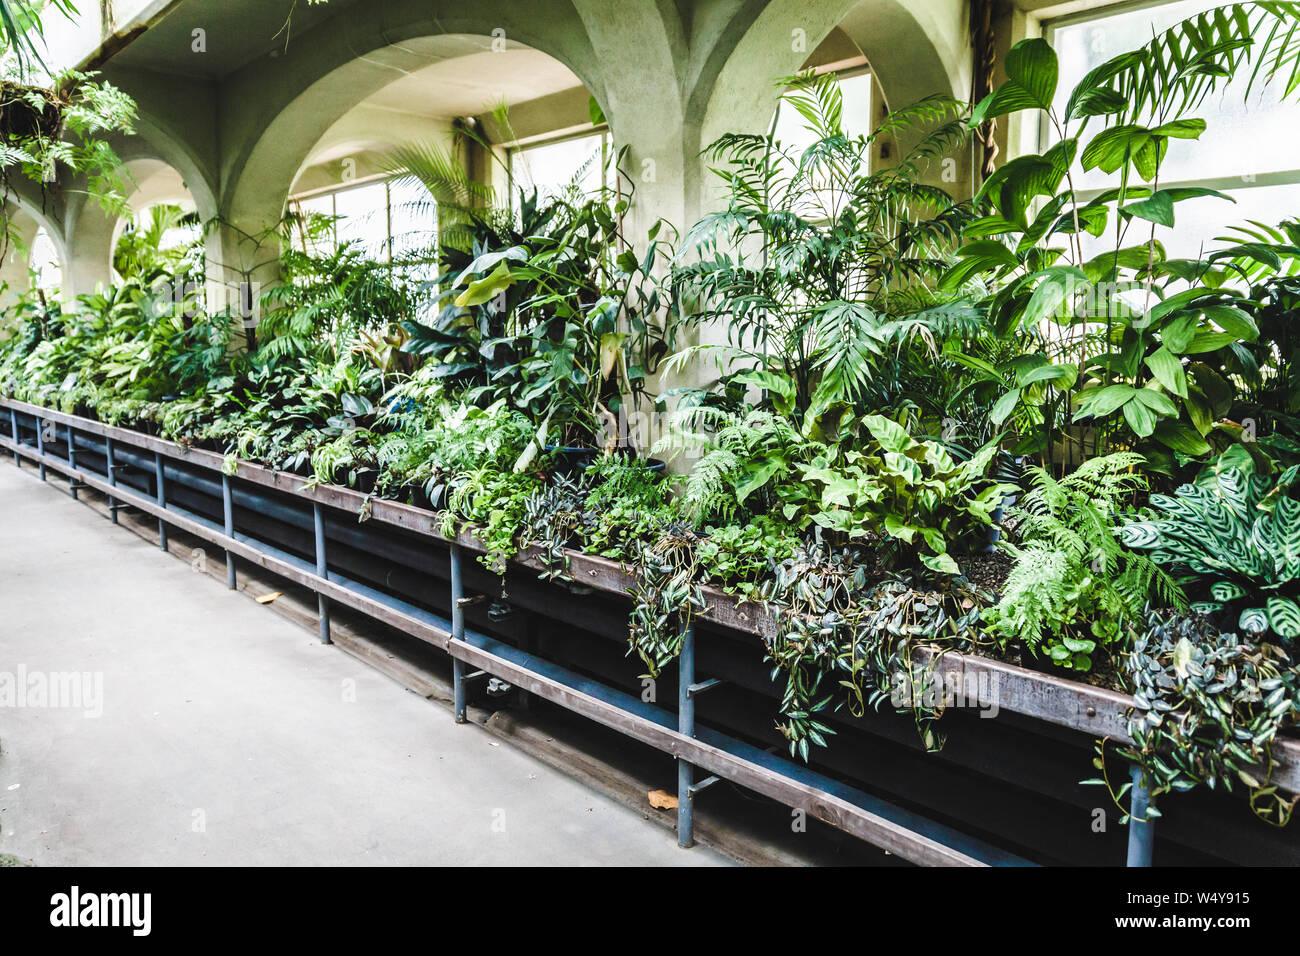 Tropical Greenhouse Glasshouse Sunny Interior Full Of Lush Green